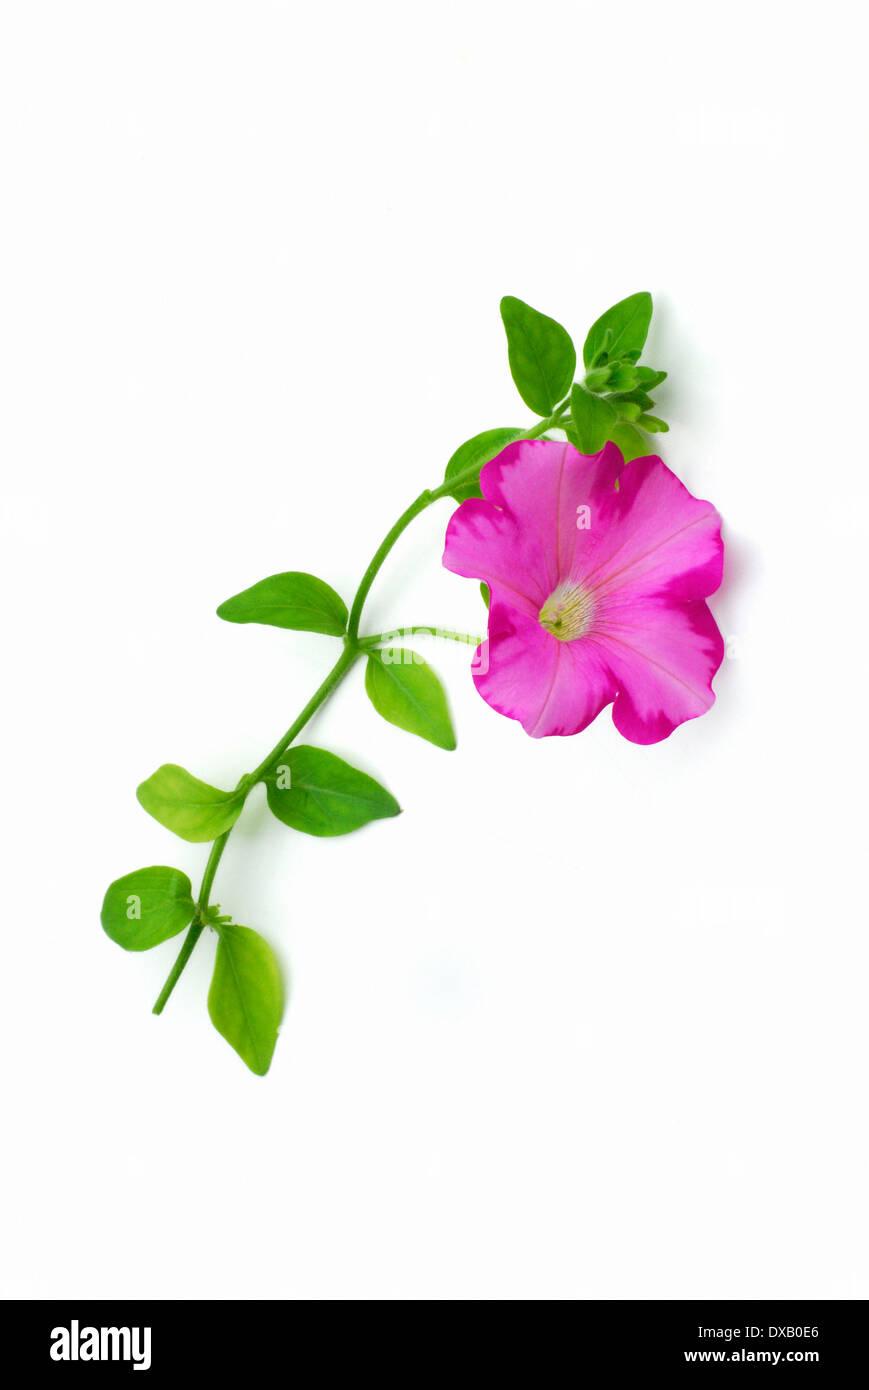 Petunia - Stock Image